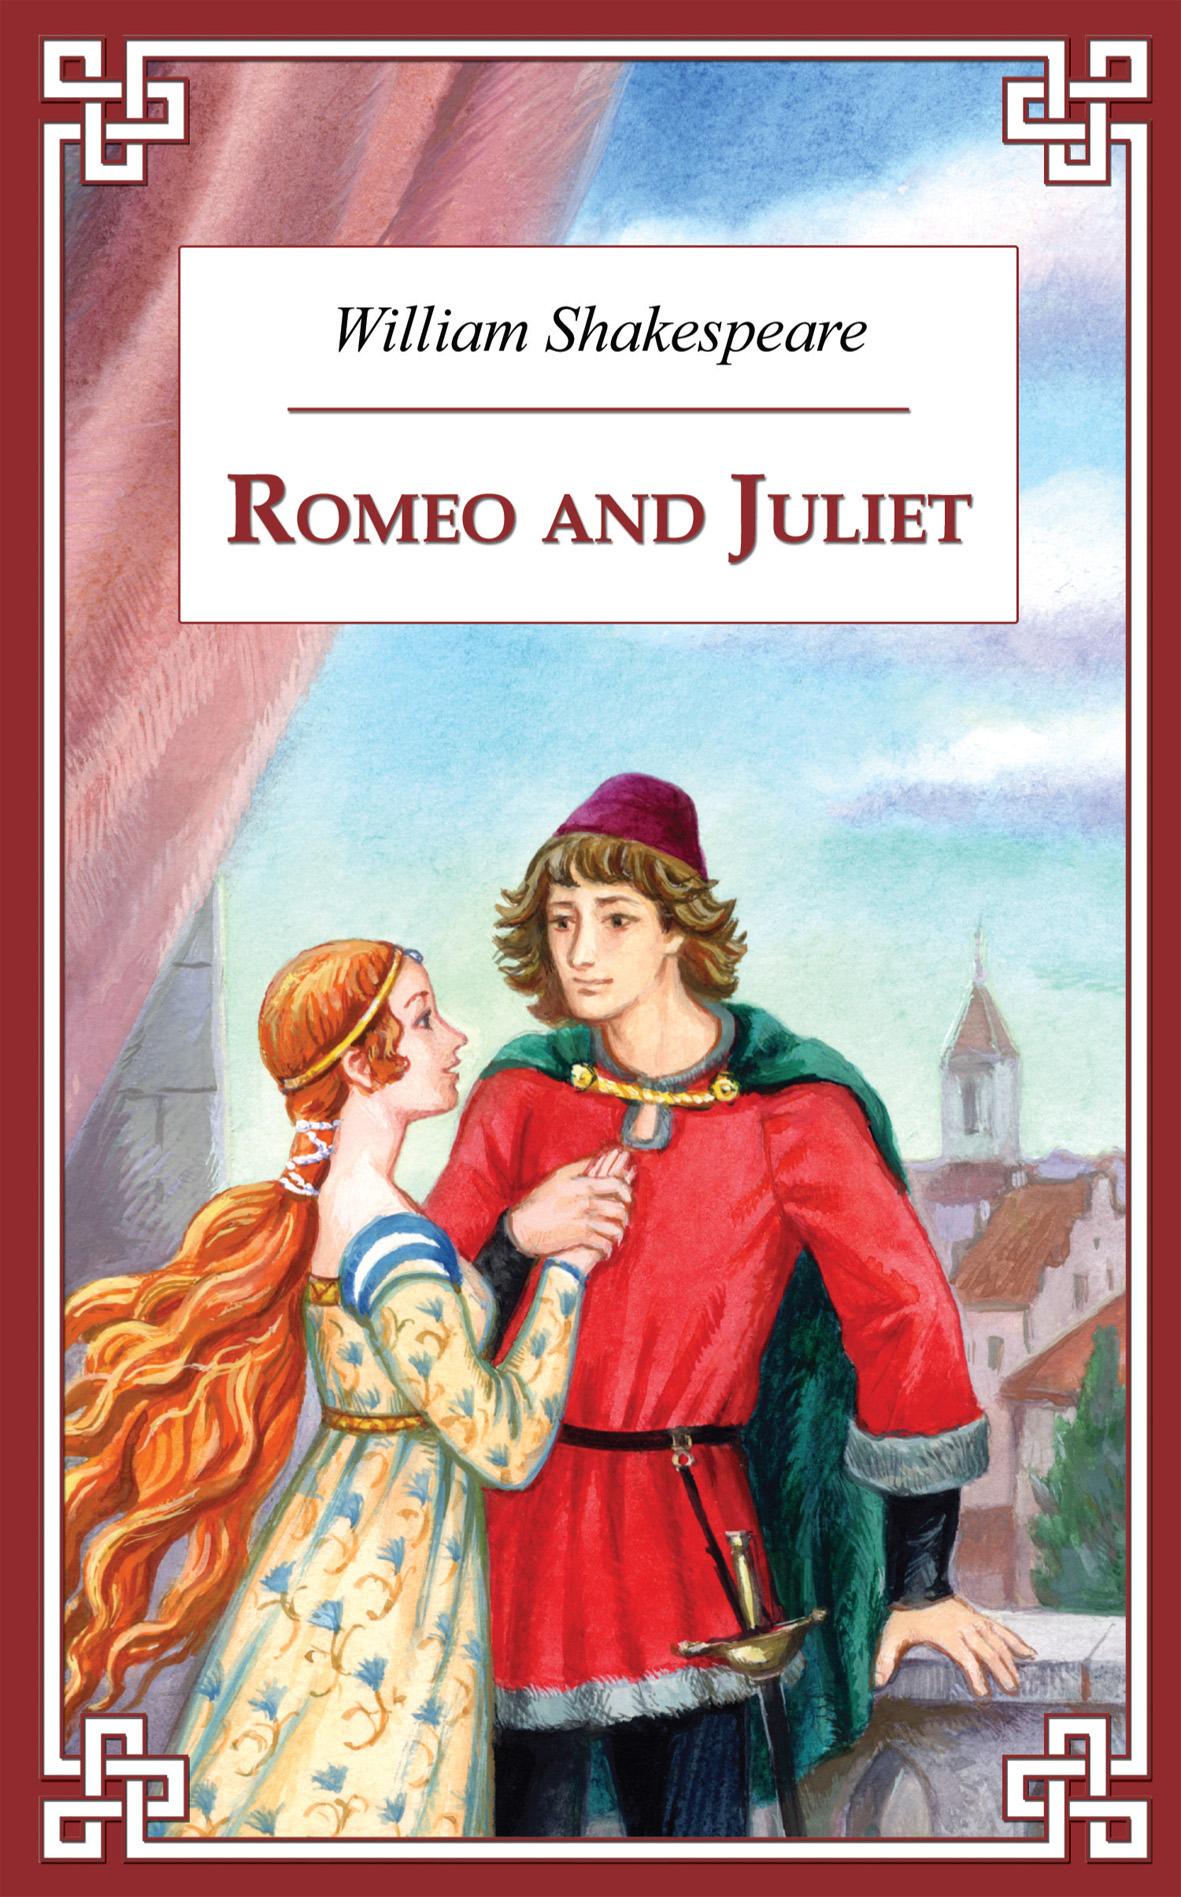 Уильям Шекспир Romeo and Juliet / Ромео и Джульетта shakespeare william rdr cd [lv 2] romeo and juliet